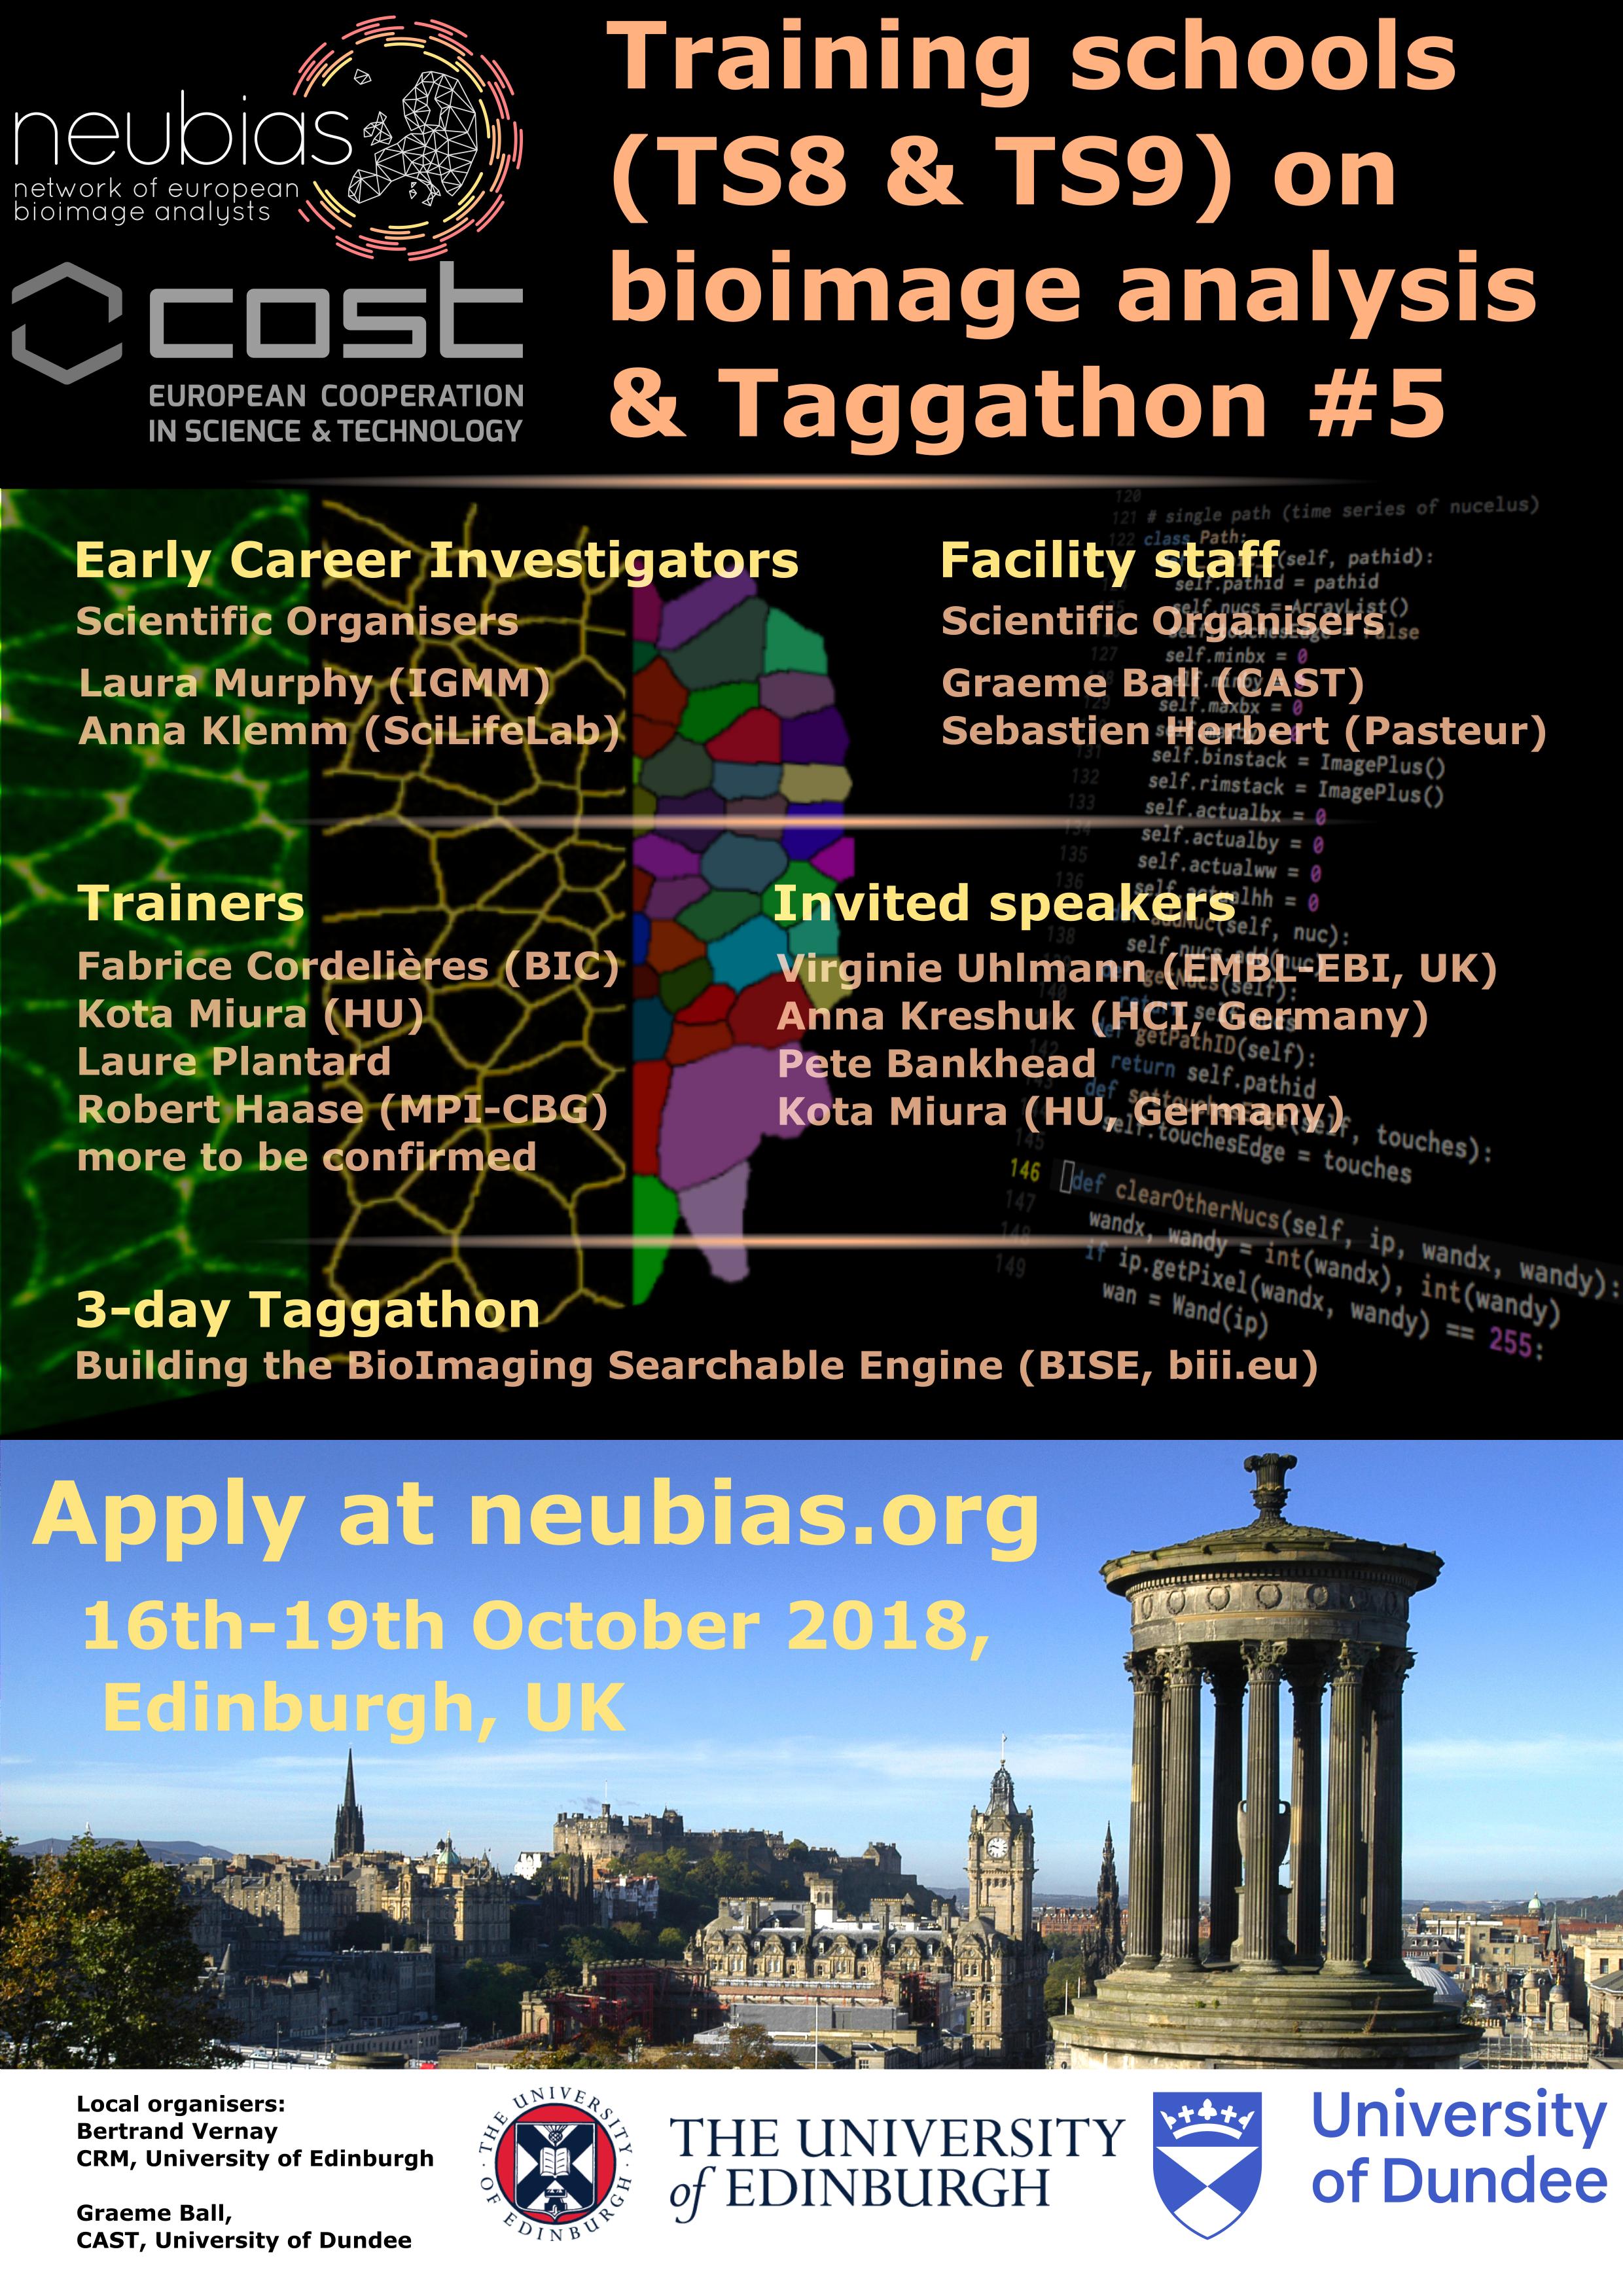 TS8 Edinburgh 2018 - NEUBIAS: Network of BioImage Analysts